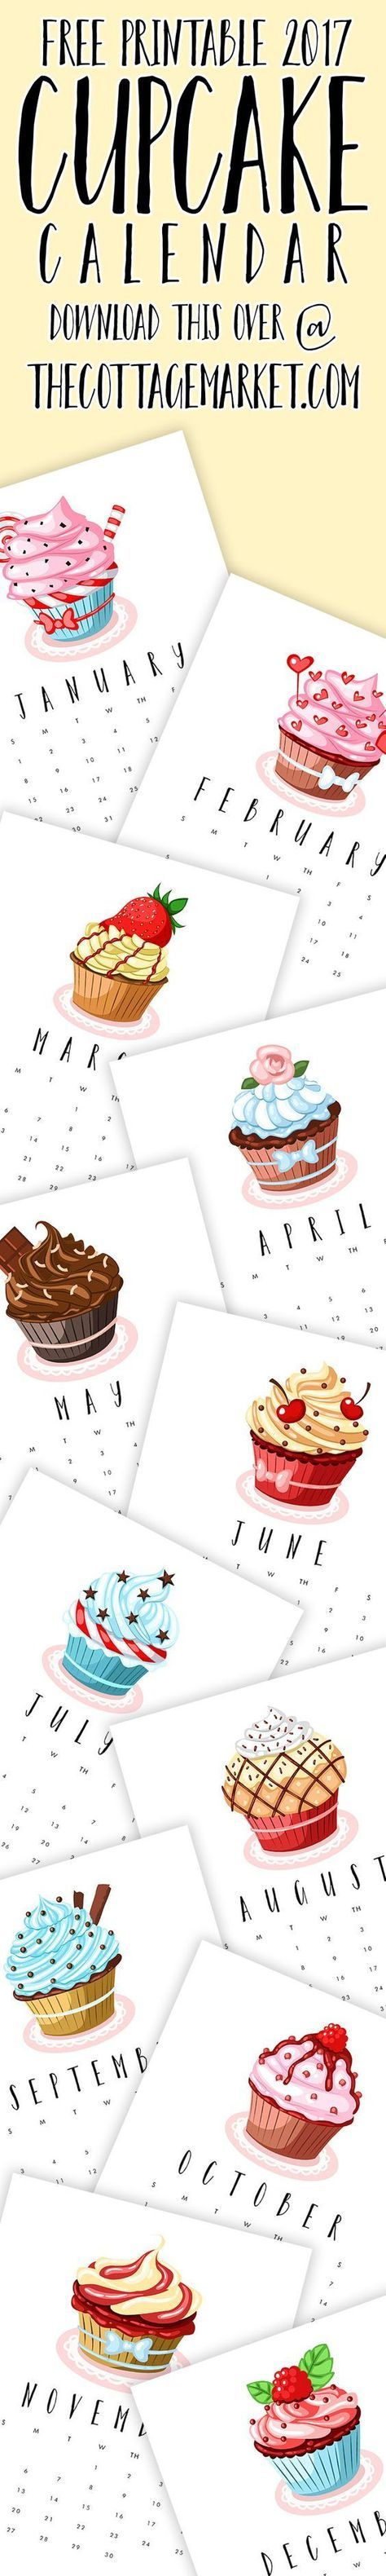 Free Printable 2017 Cupcake Calendar via The Cottage Market...Perfect to Celebrate Baking Week!